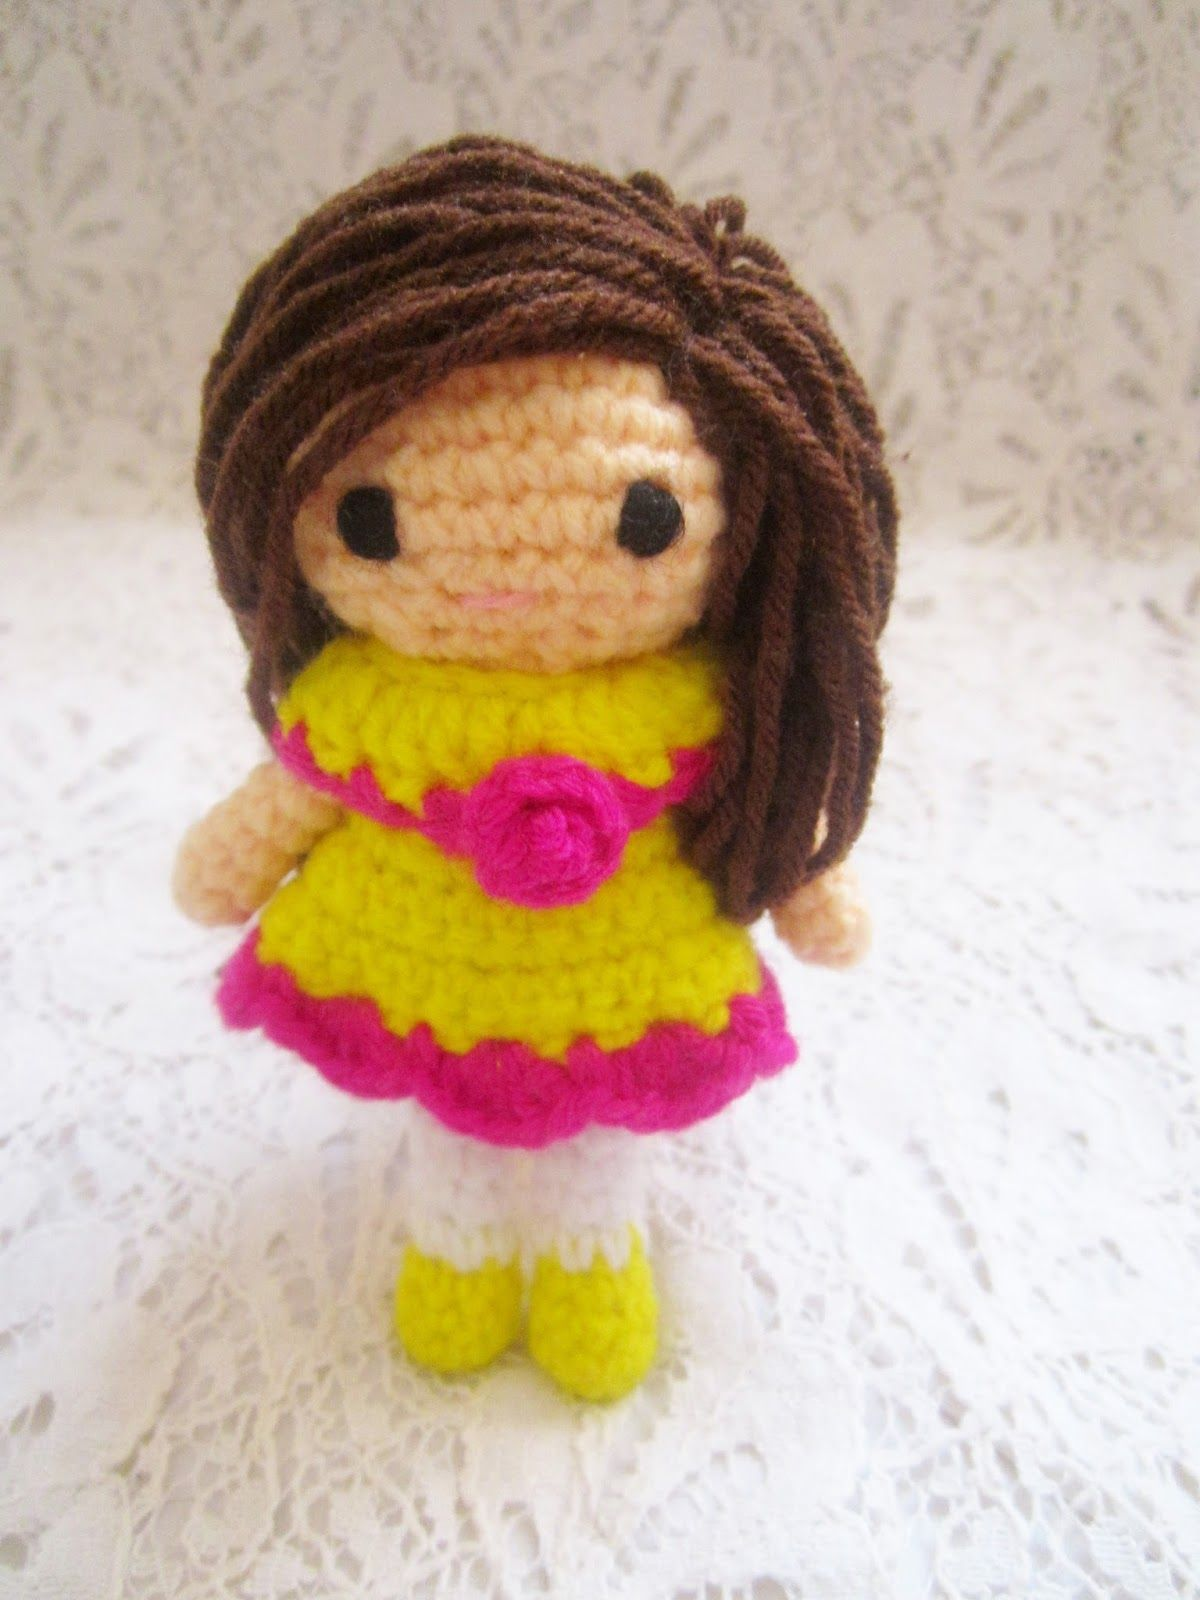 Tiny Amigurumi Doll : A little love everyday amigurumi doll pattern